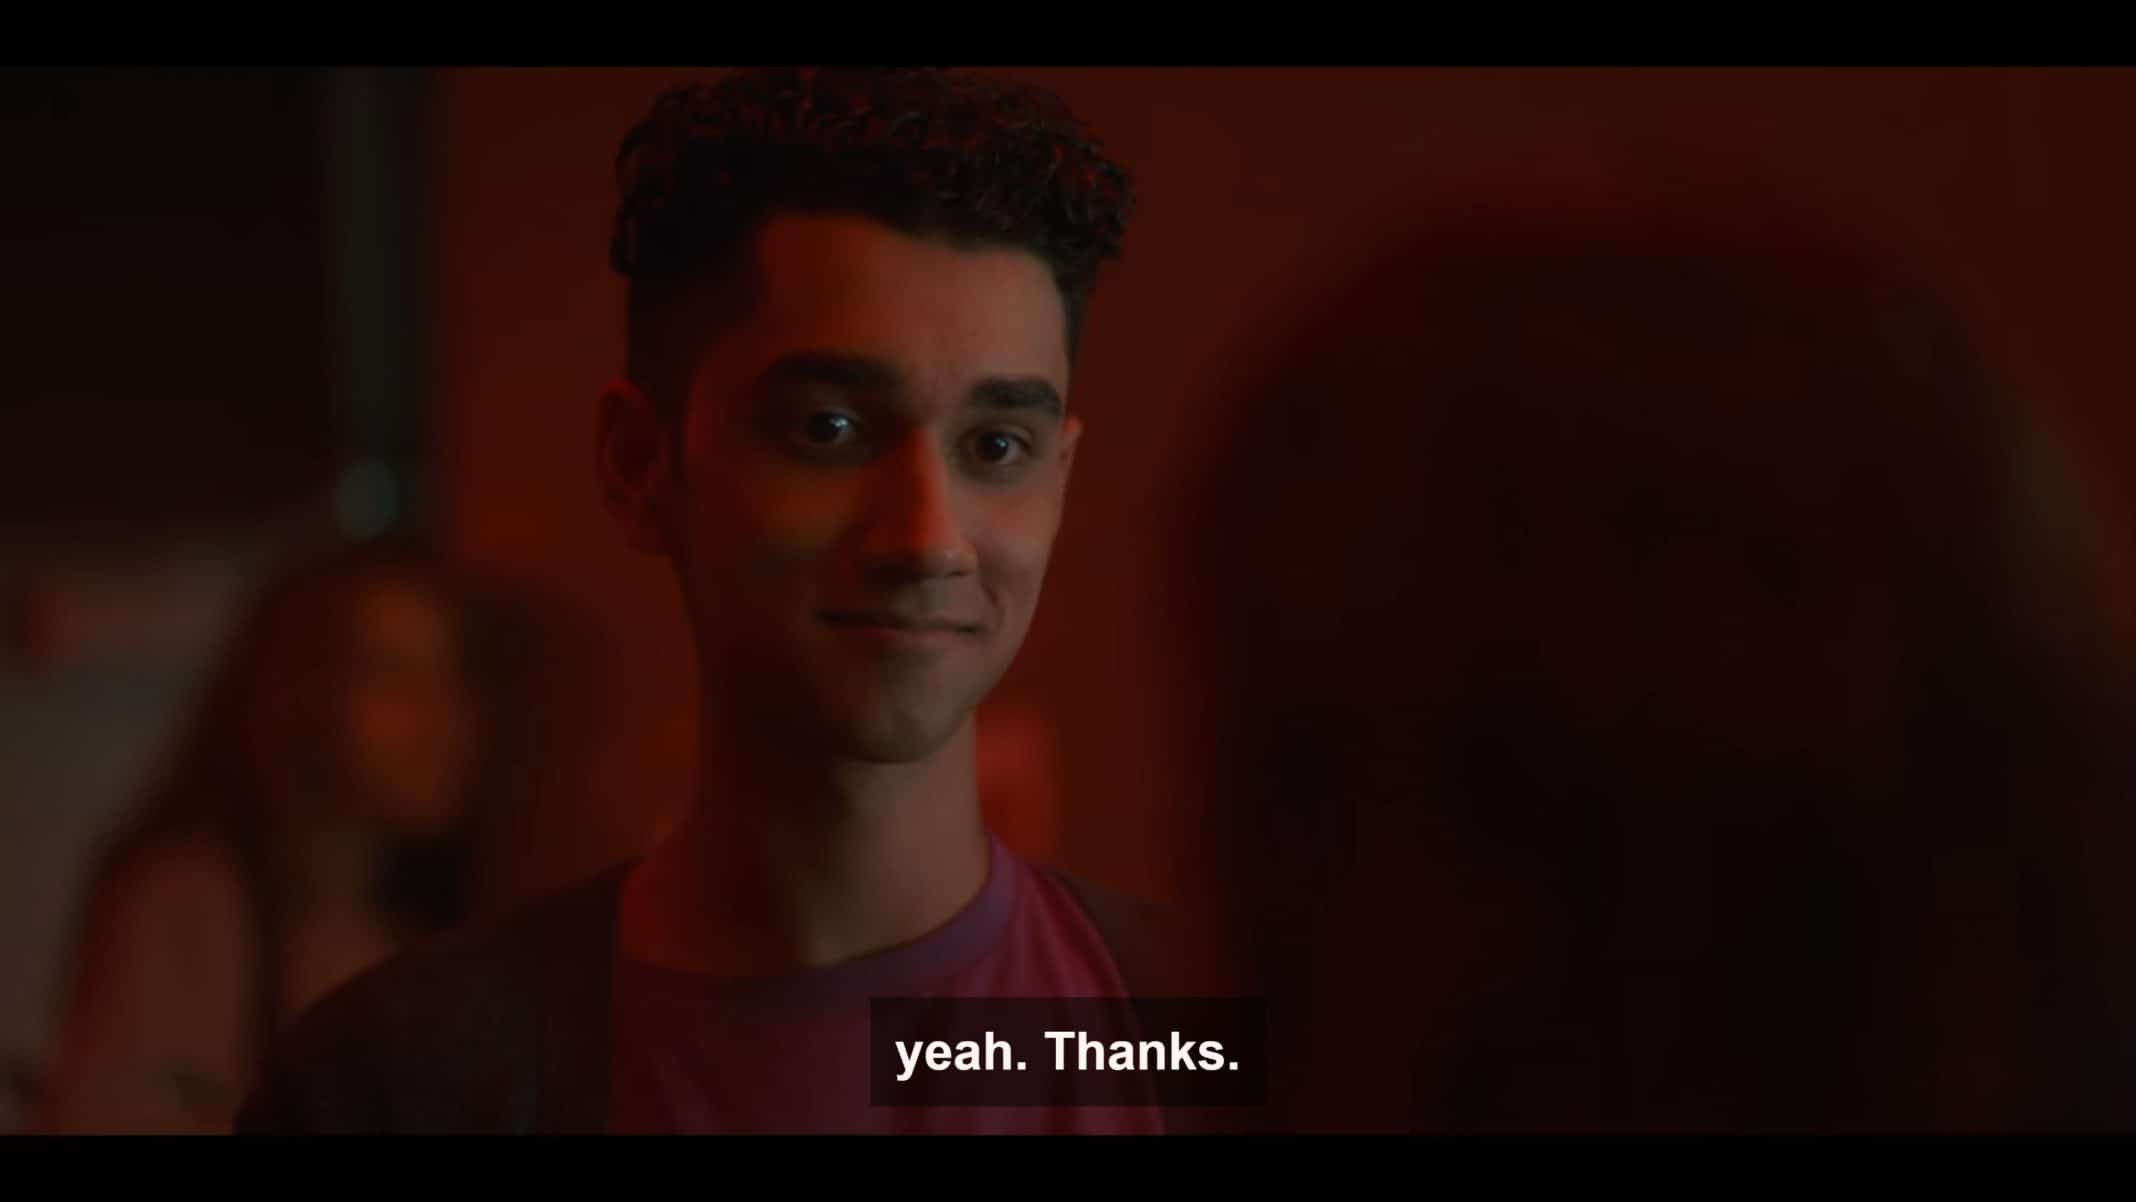 Omar (Zac Kara) being nice to Leila